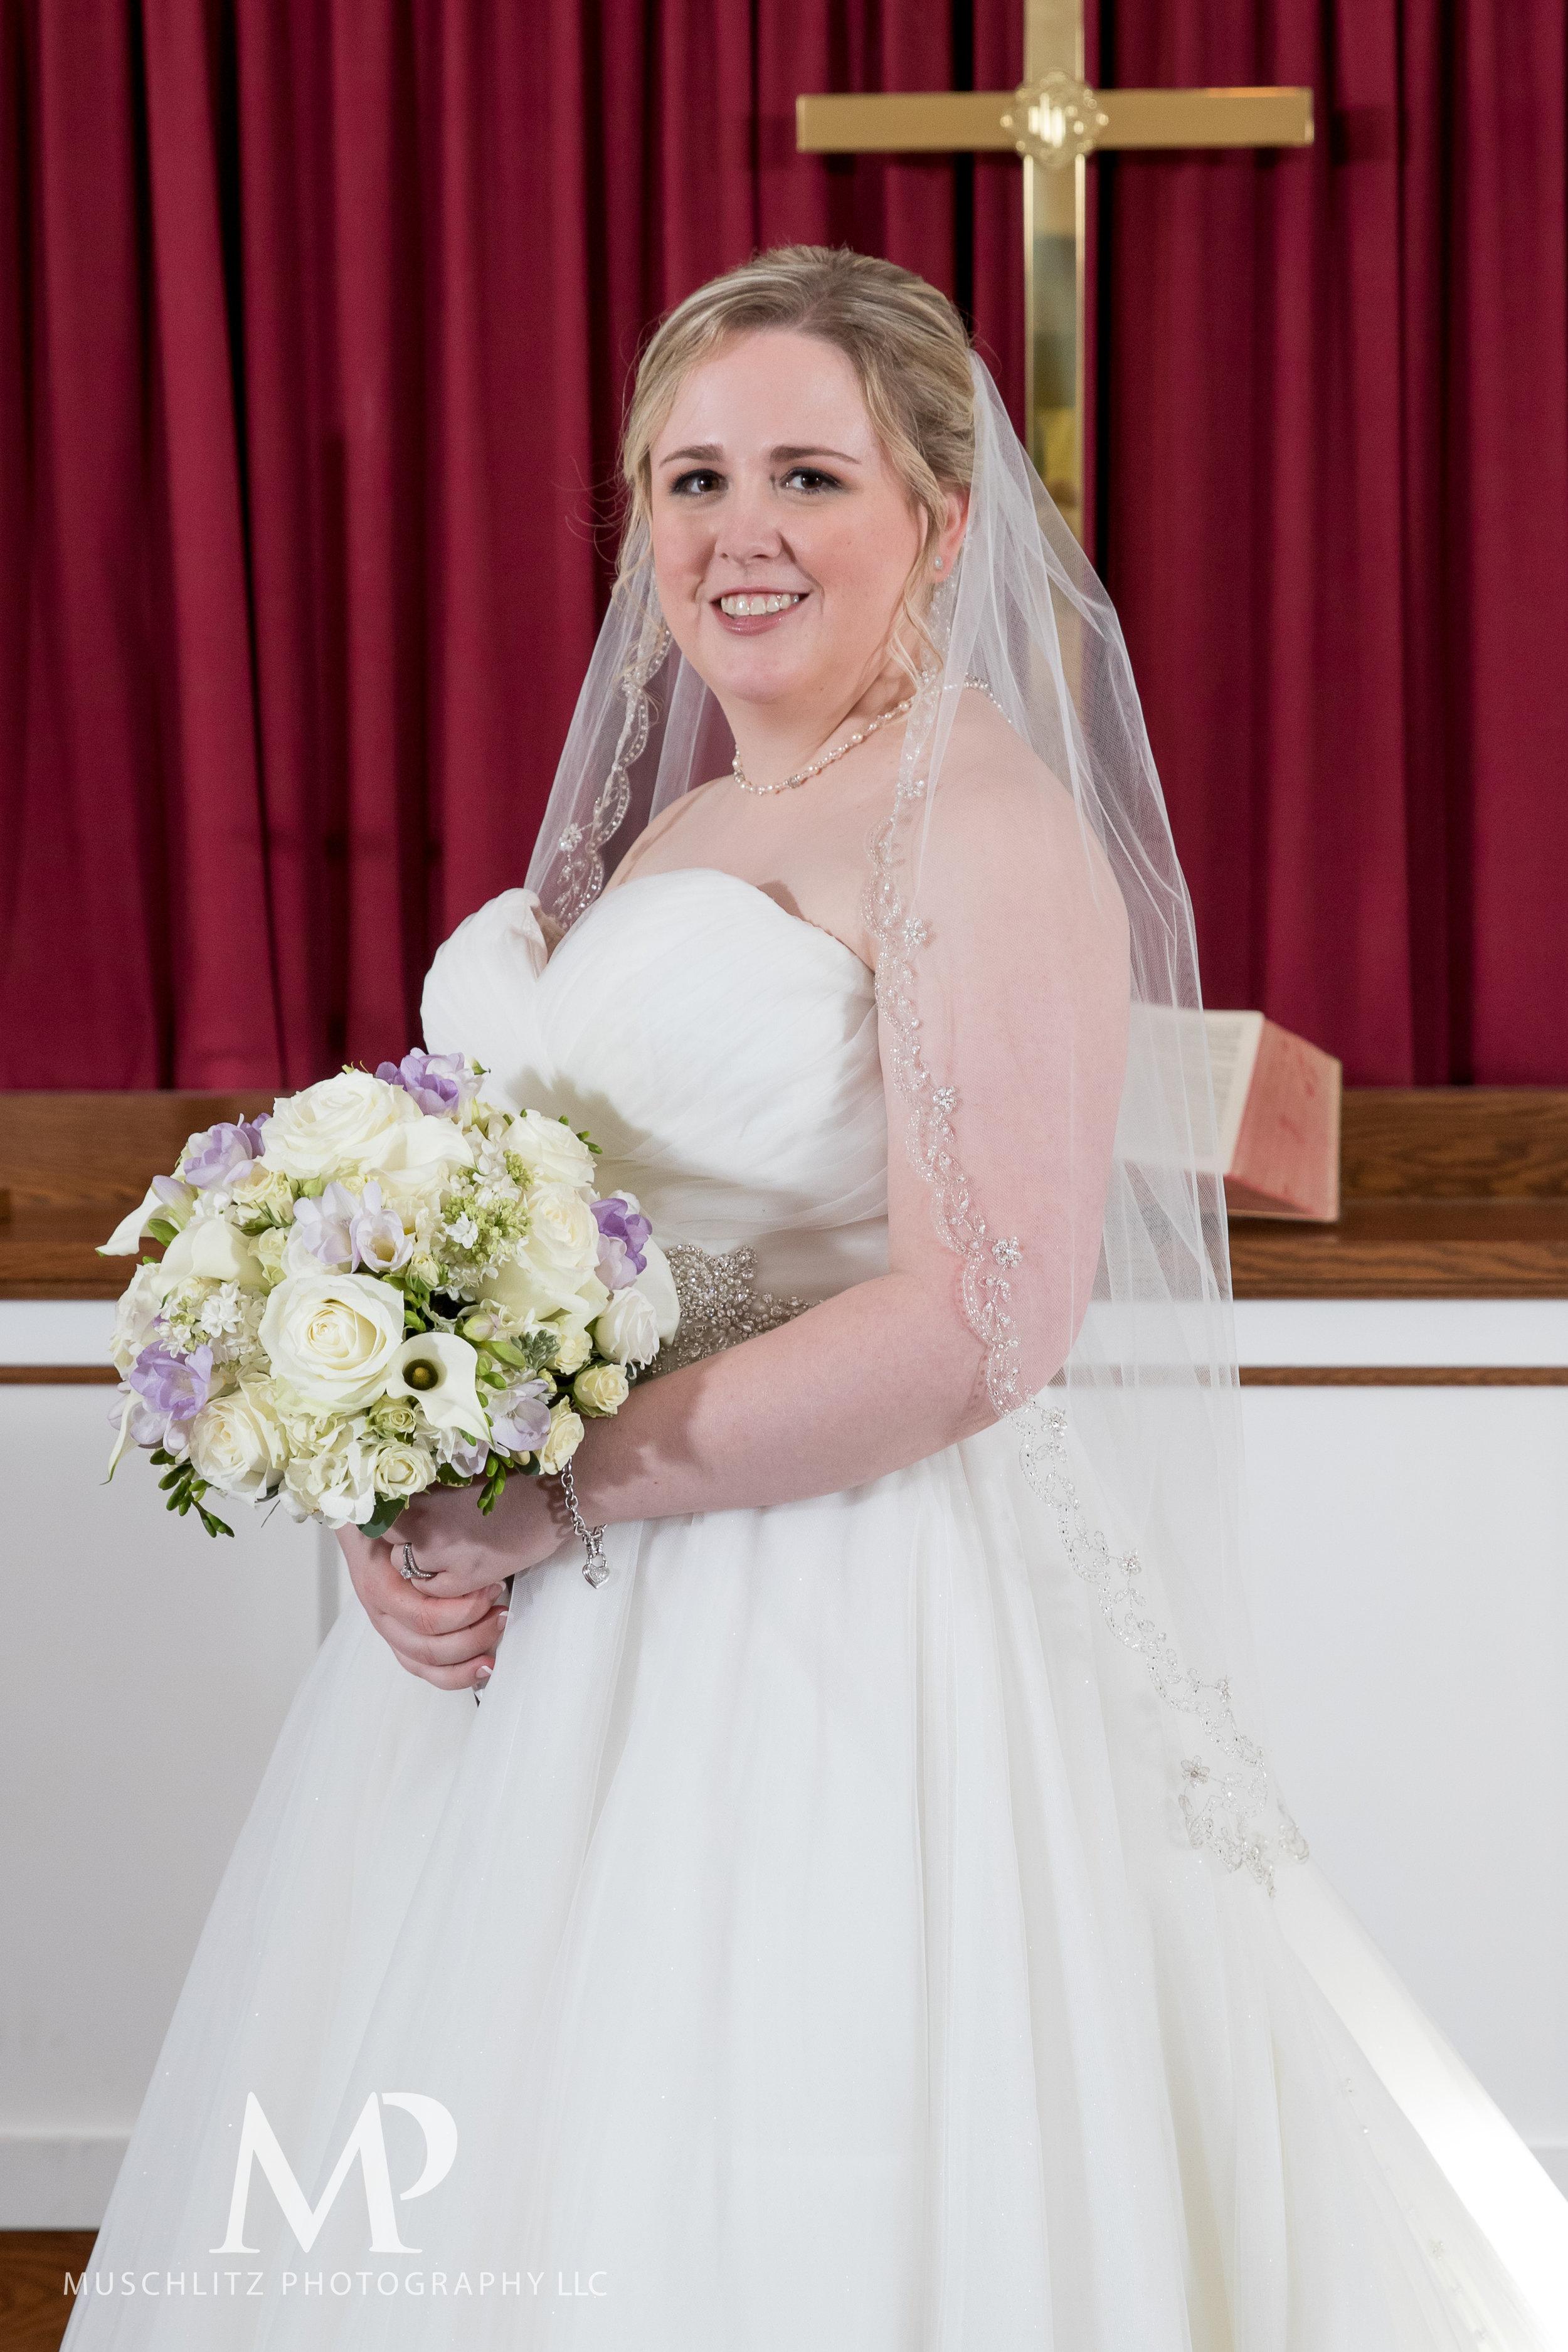 dublin-community-church-wedding-columbus-ohio-muschlitz-photography-070.JPG